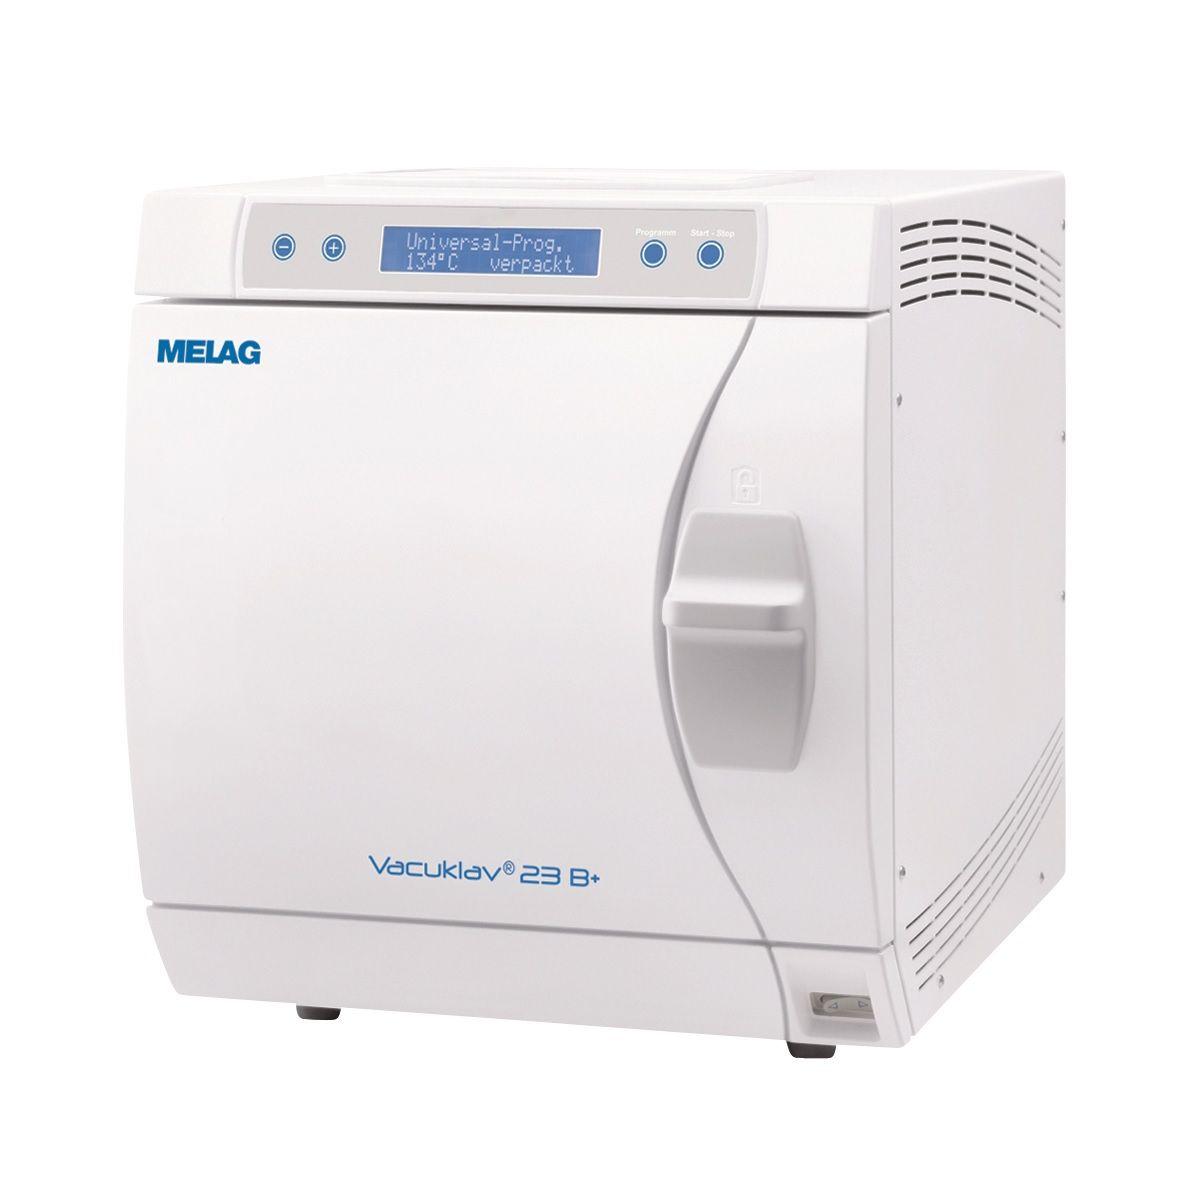 slide image Sterilisator Autoklav Vacuklav® 23 B+ - Sonder-Paket